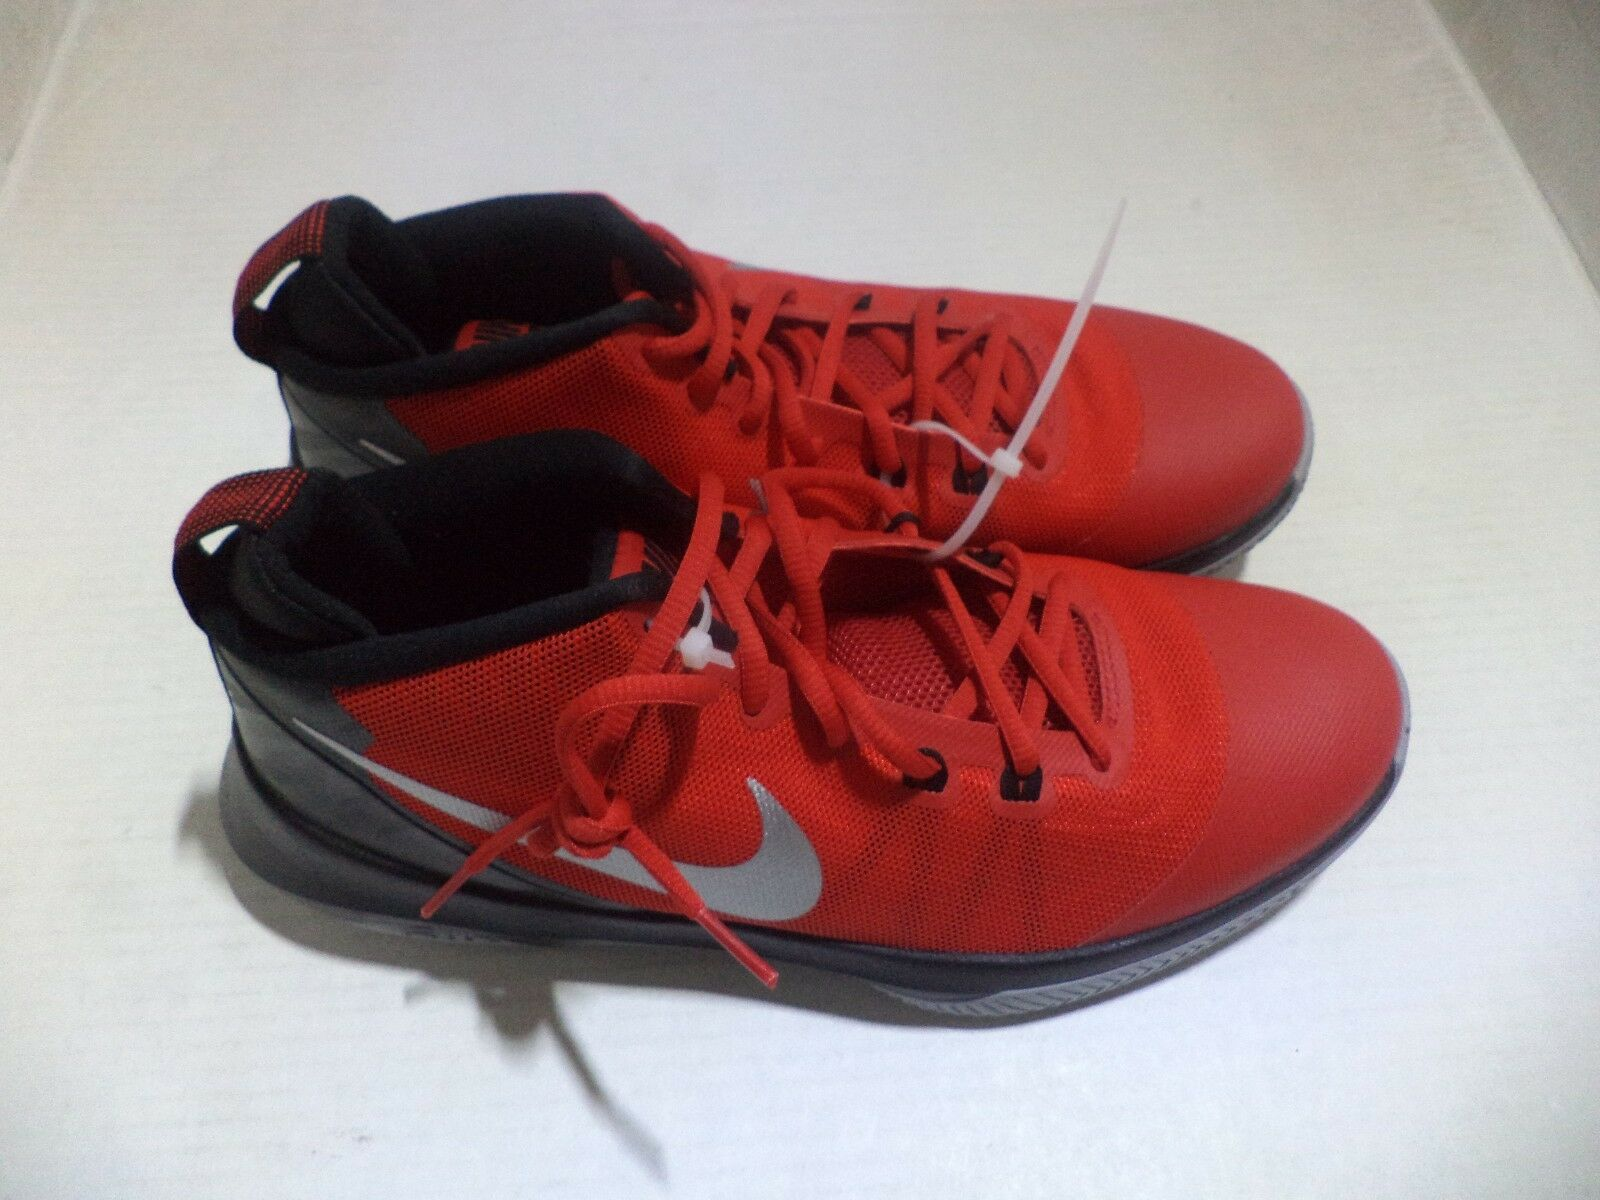 NIKE Men's Air Versitile Nbk Basketball-Shoes Size 11 Colors Black White Univers